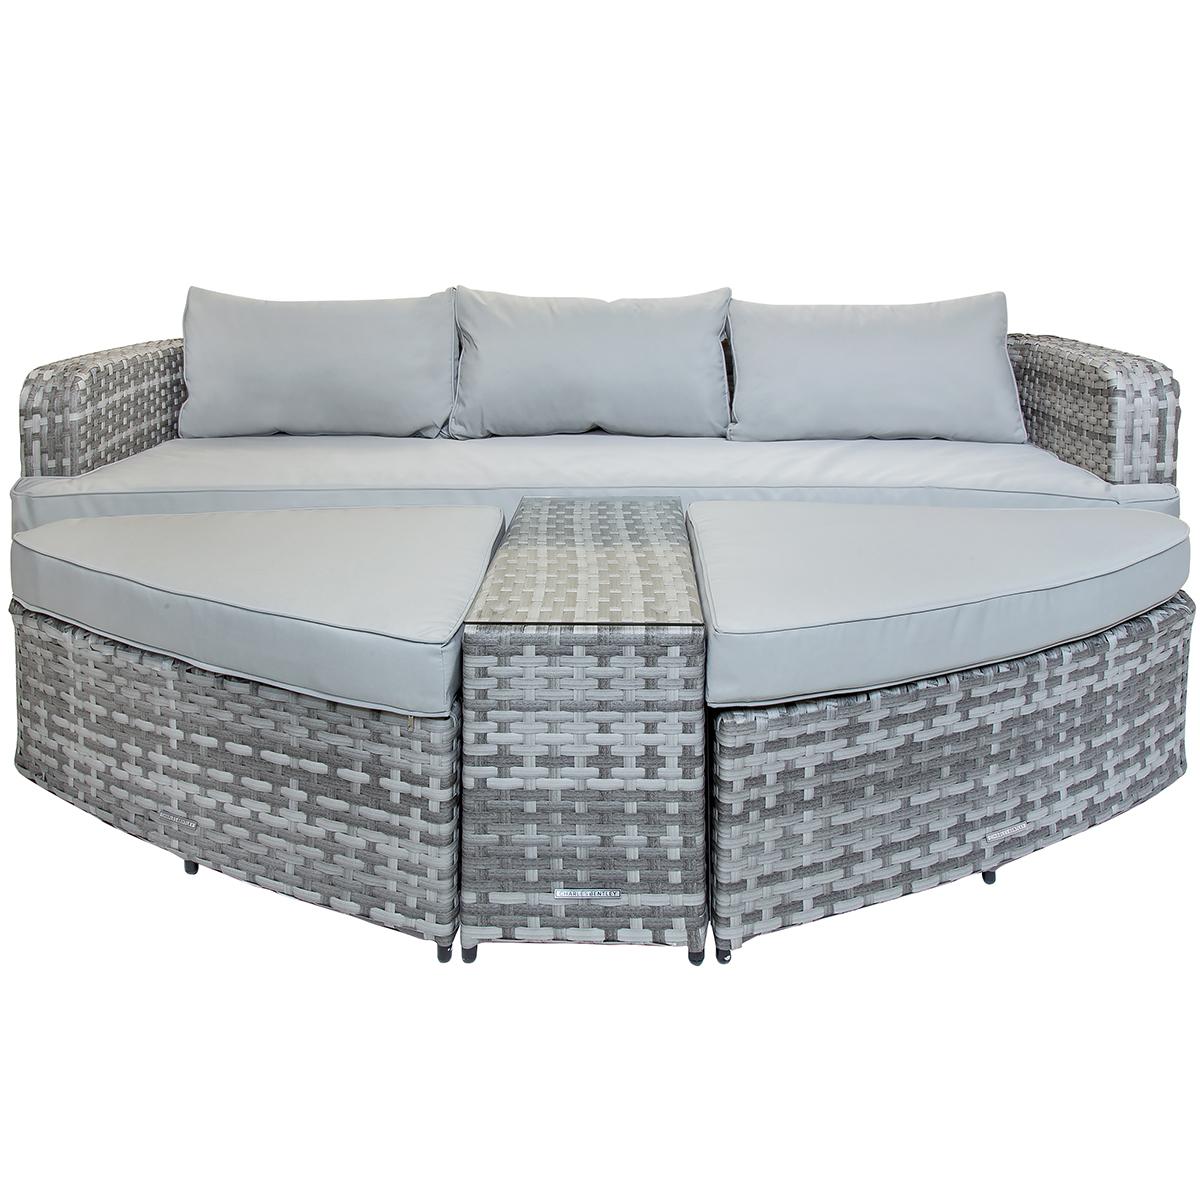 rattan modular sofa daybed footstools table rattan. Black Bedroom Furniture Sets. Home Design Ideas